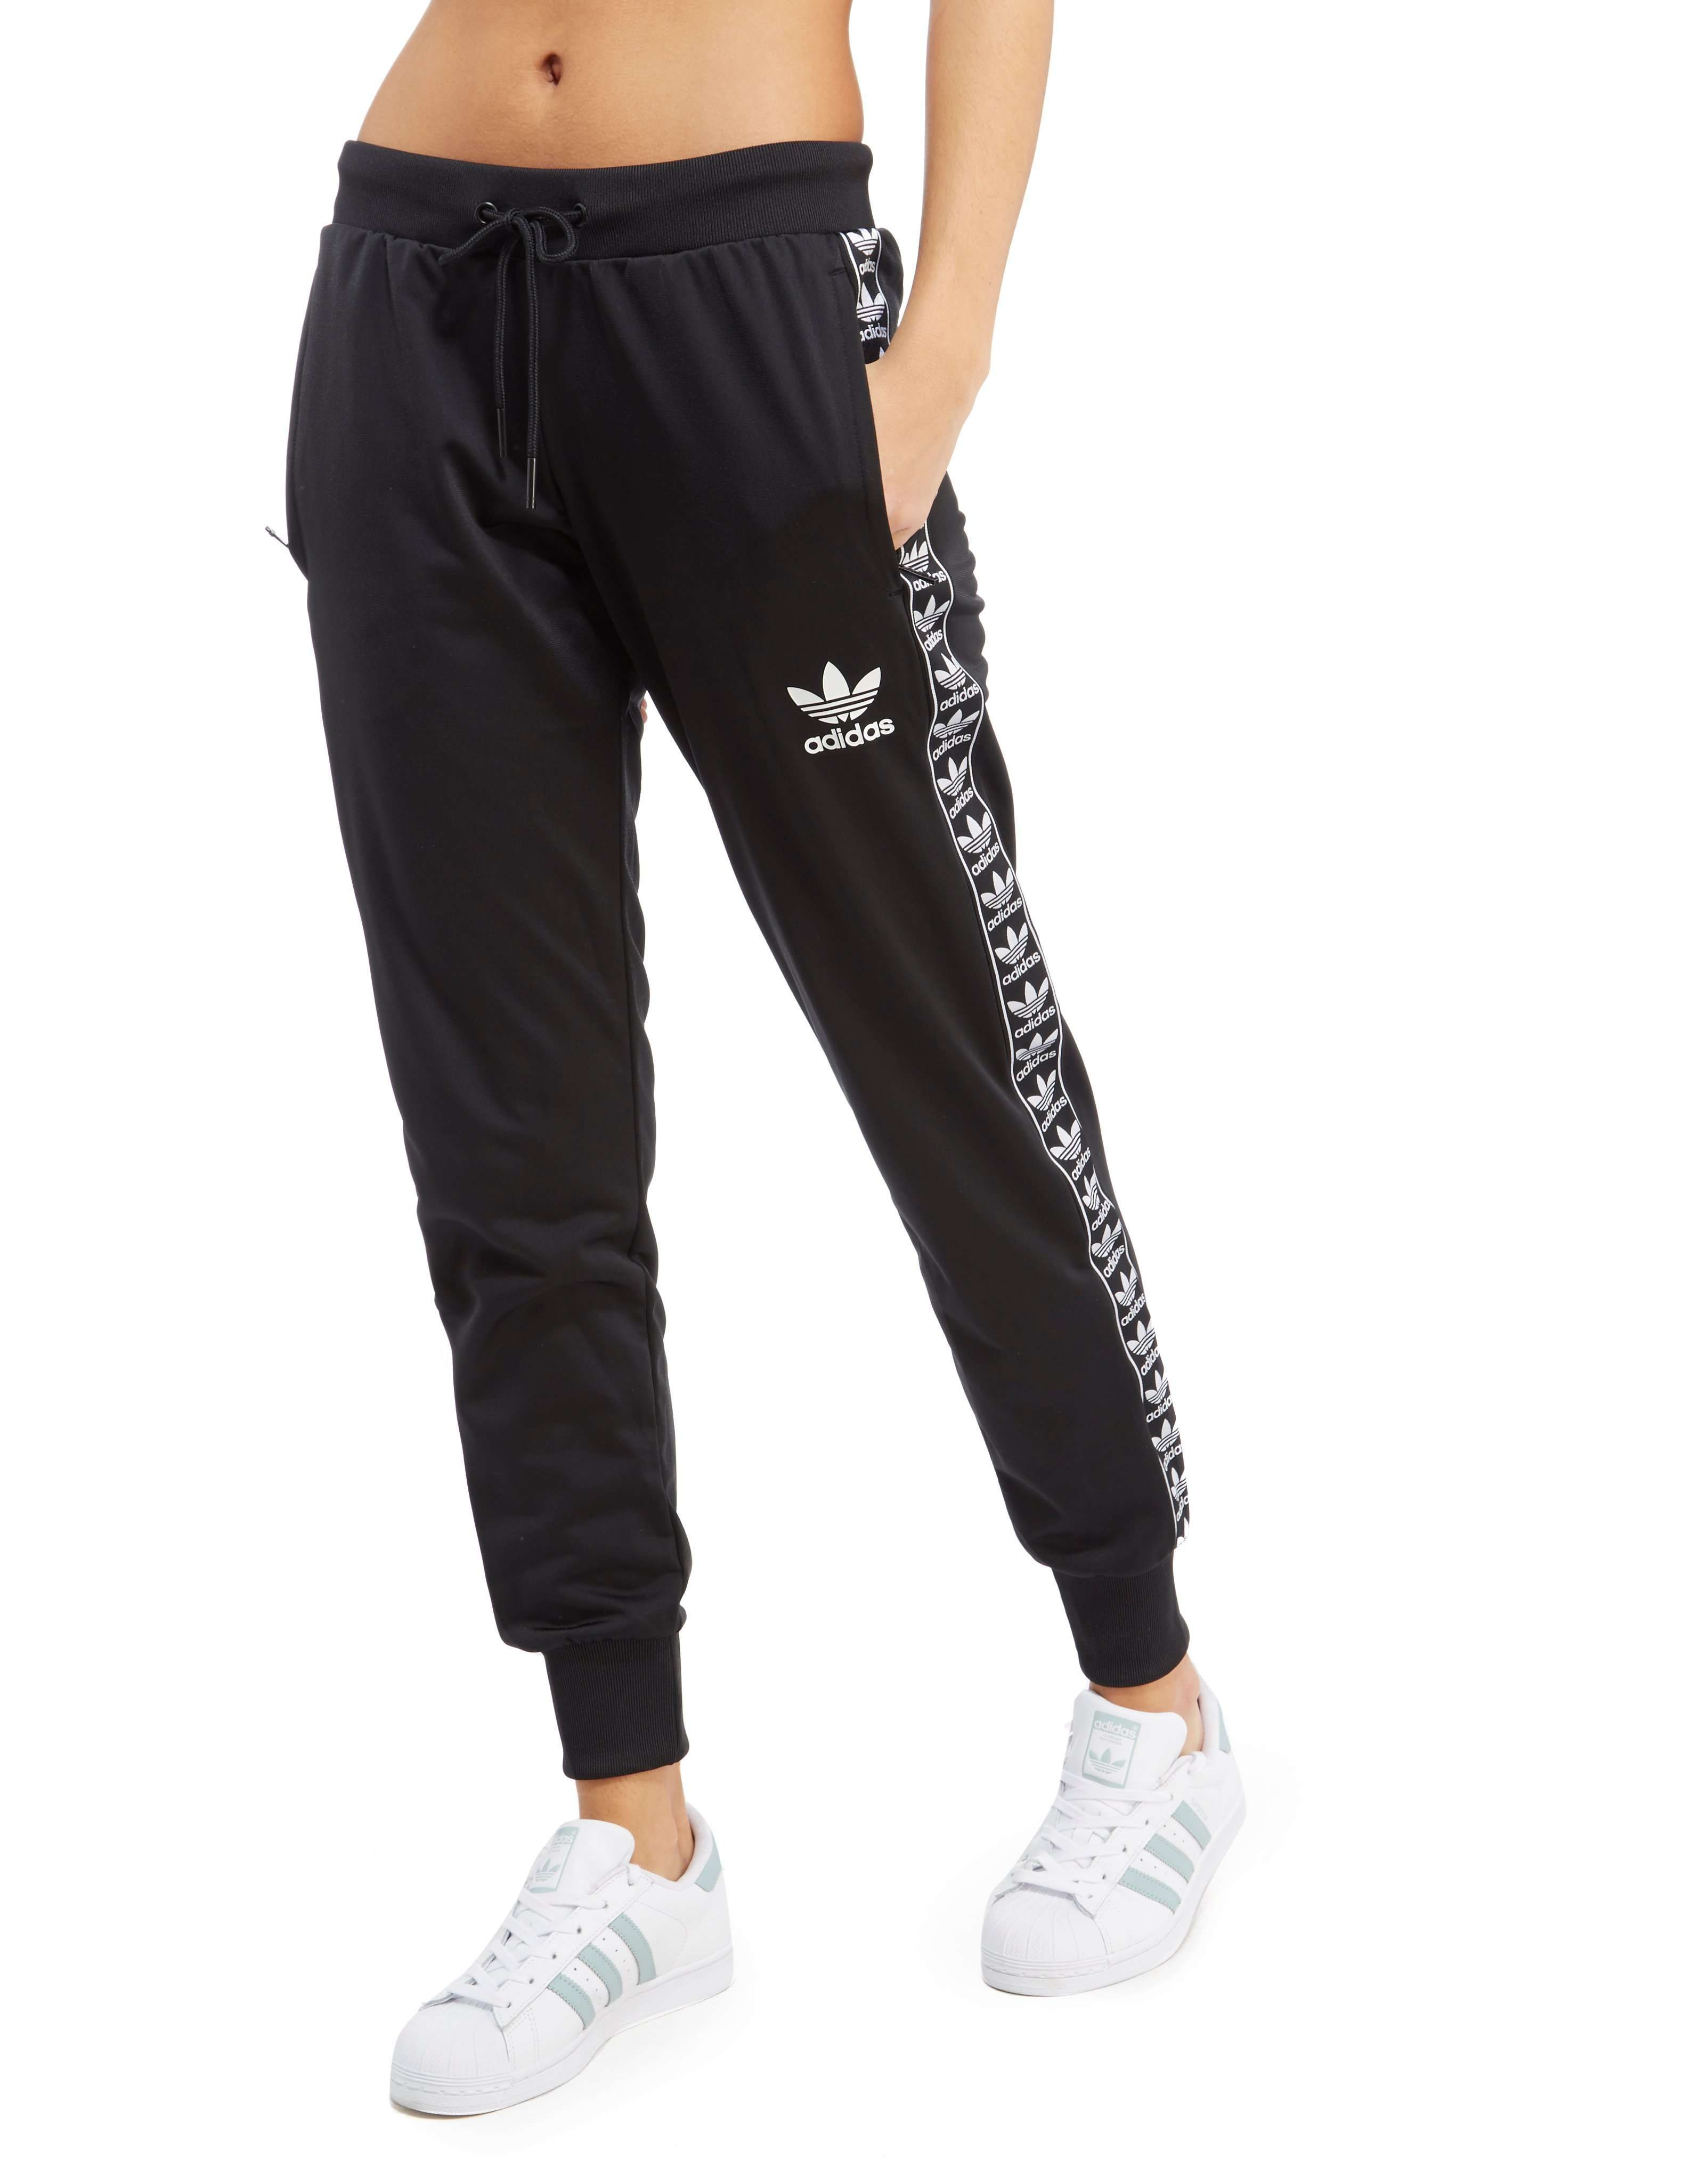 Adidas Originals Firebird Tape Track Pants Shop Online For Adidas Originals Firebird Tape Track Pants With Jd Sports Th Fashion Retail Fashion Pant Shopping